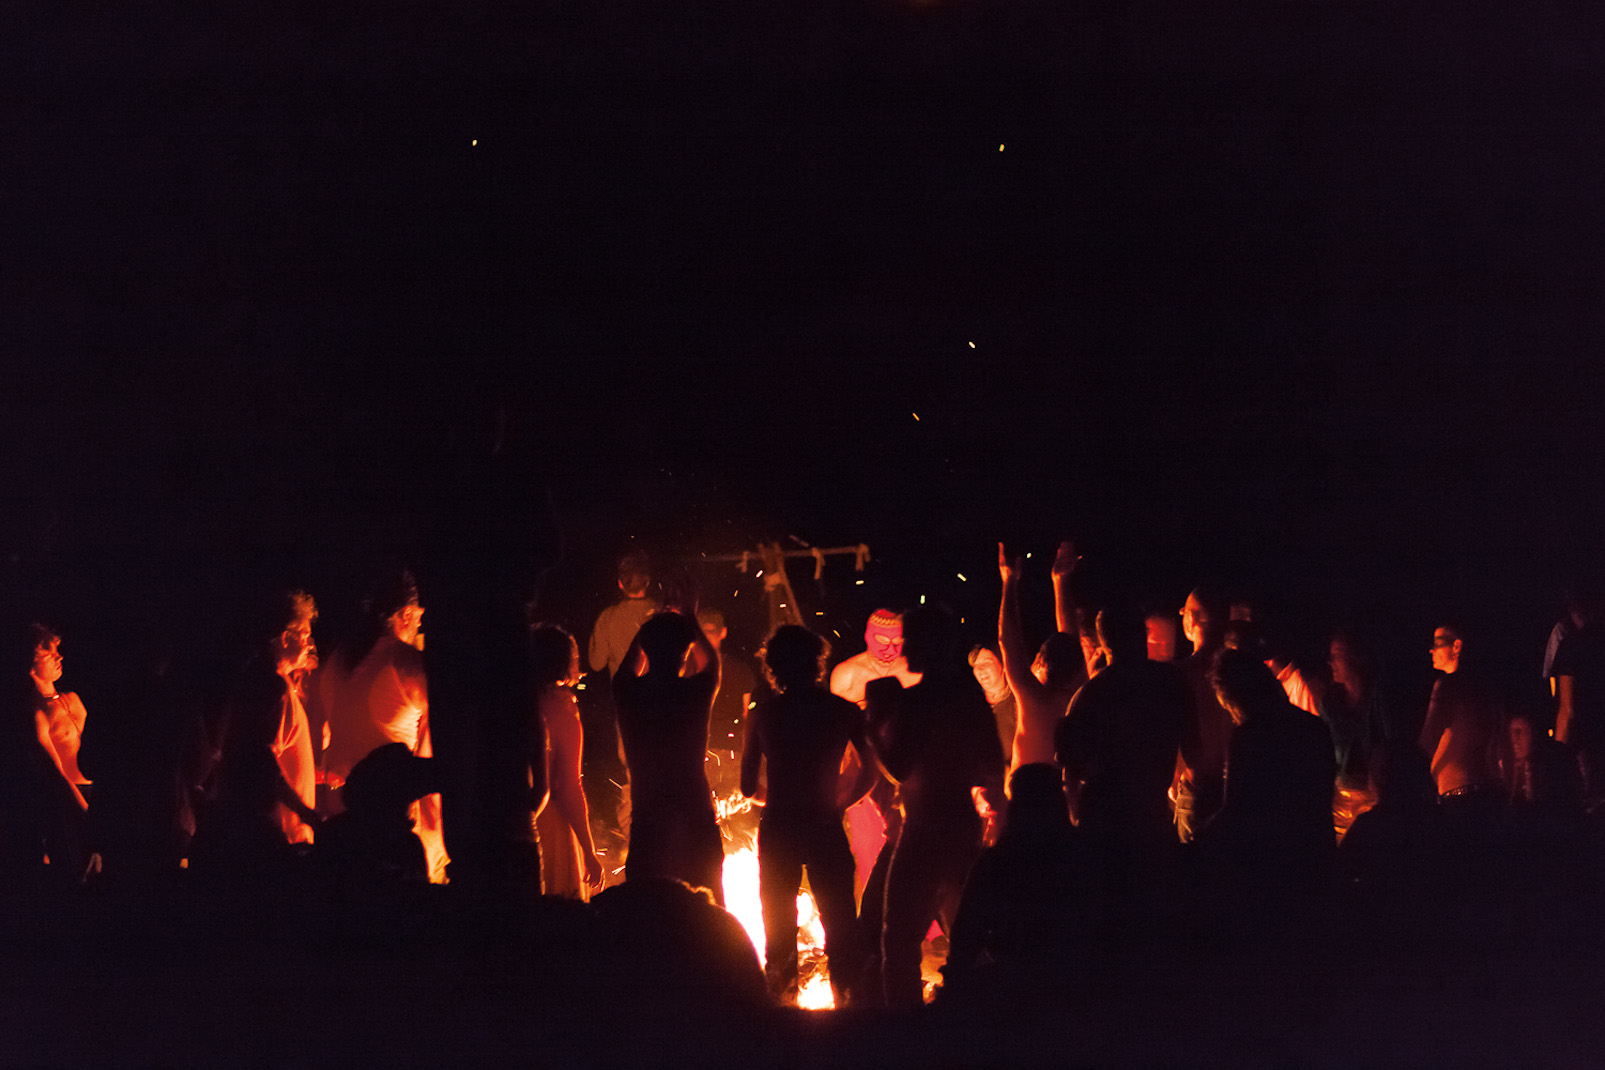 Bonfire revelry